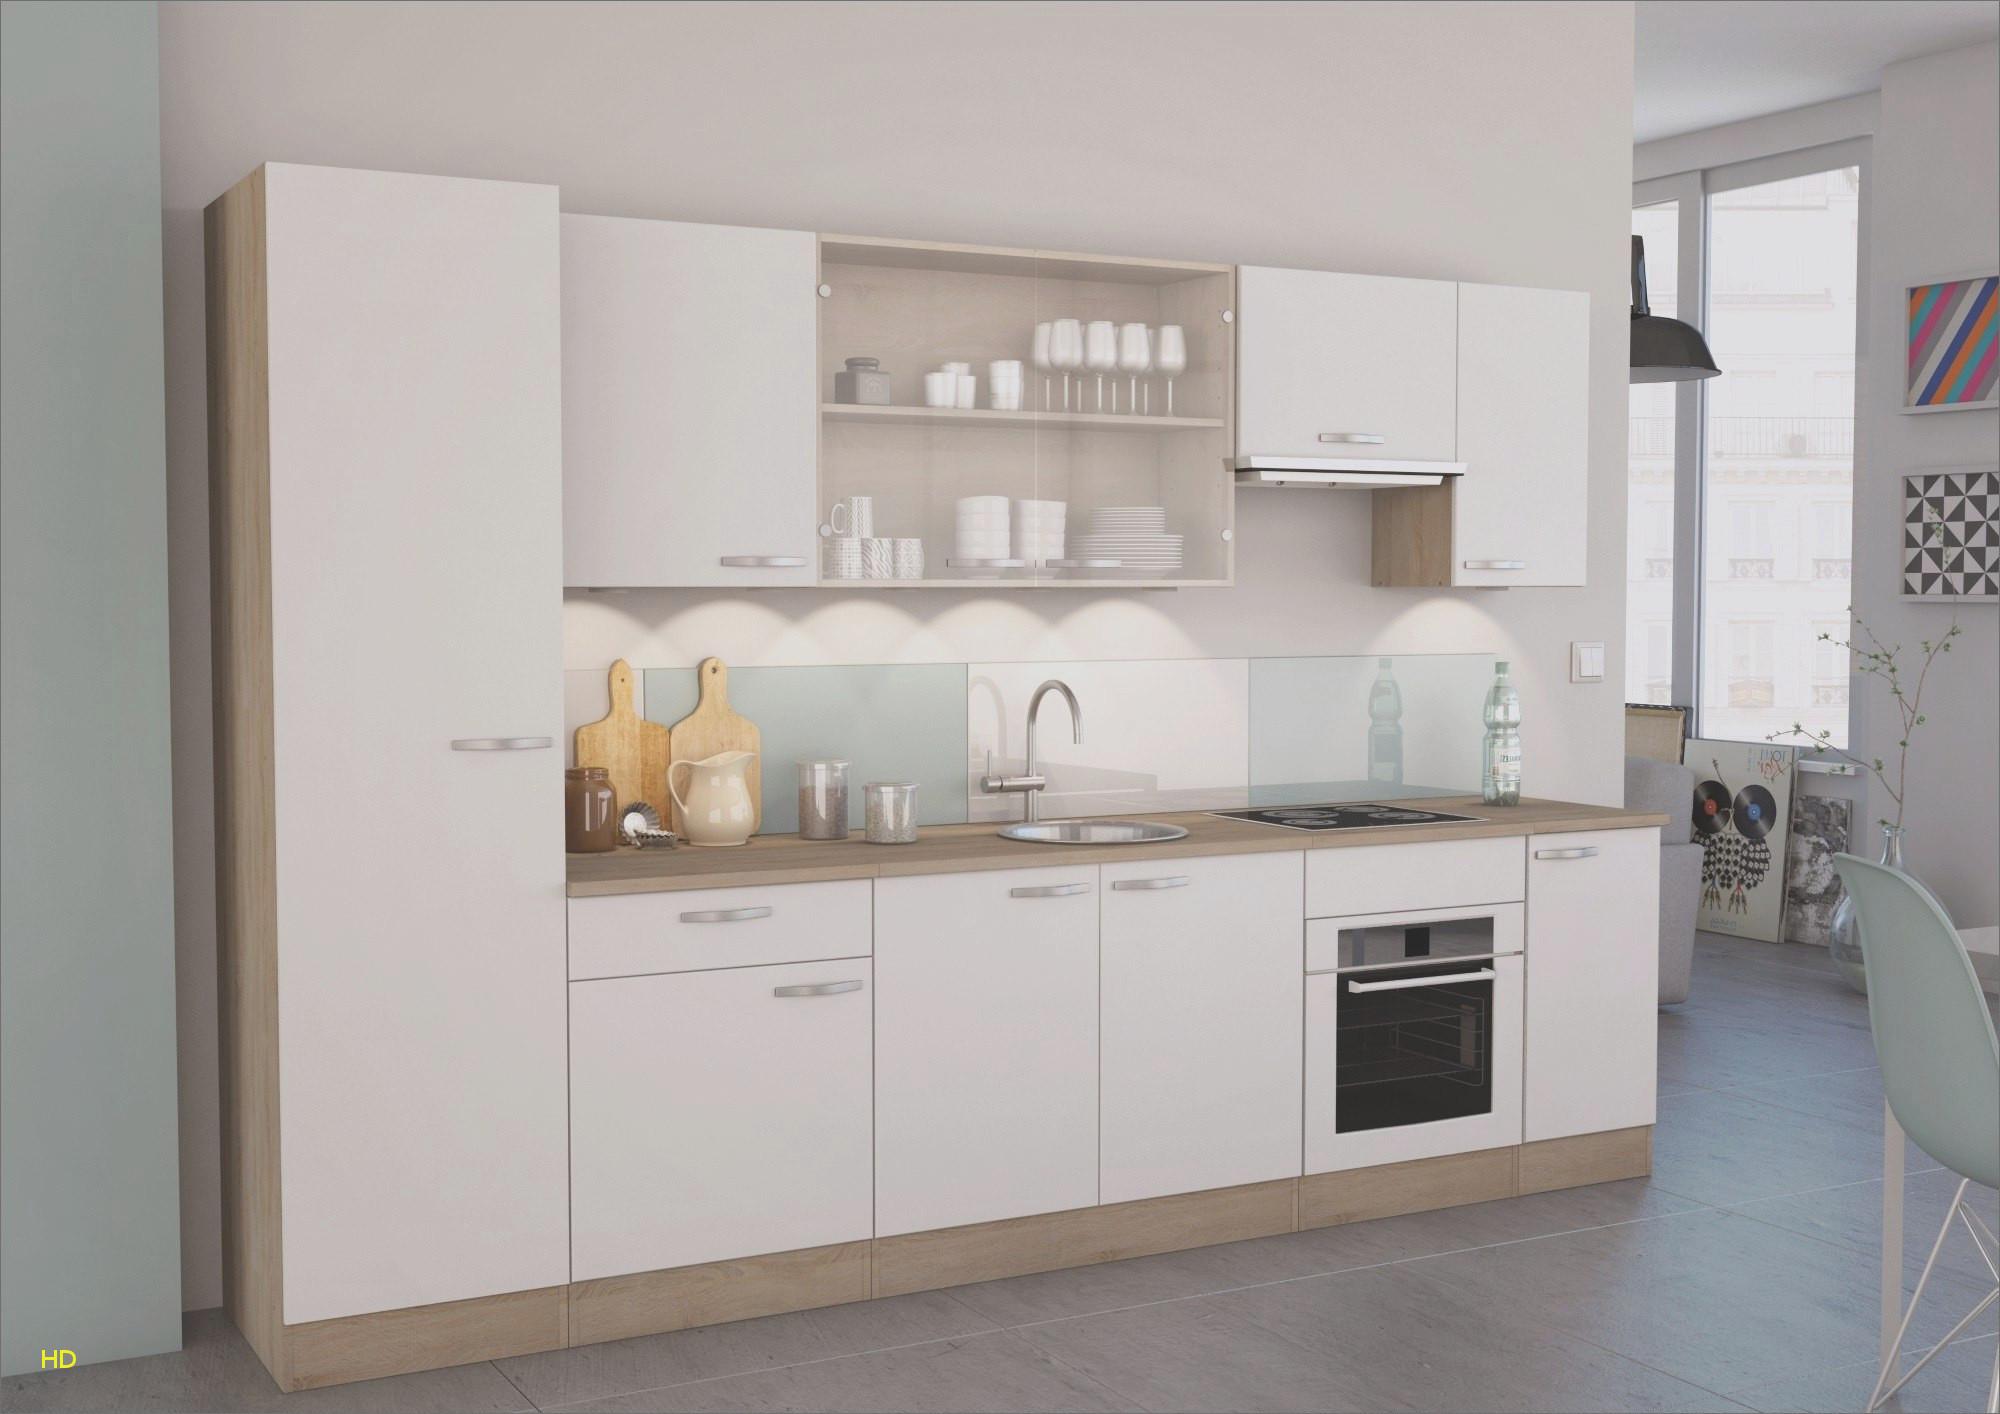 meuble hotte cuisine conforama id e pour cuisine. Black Bedroom Furniture Sets. Home Design Ideas